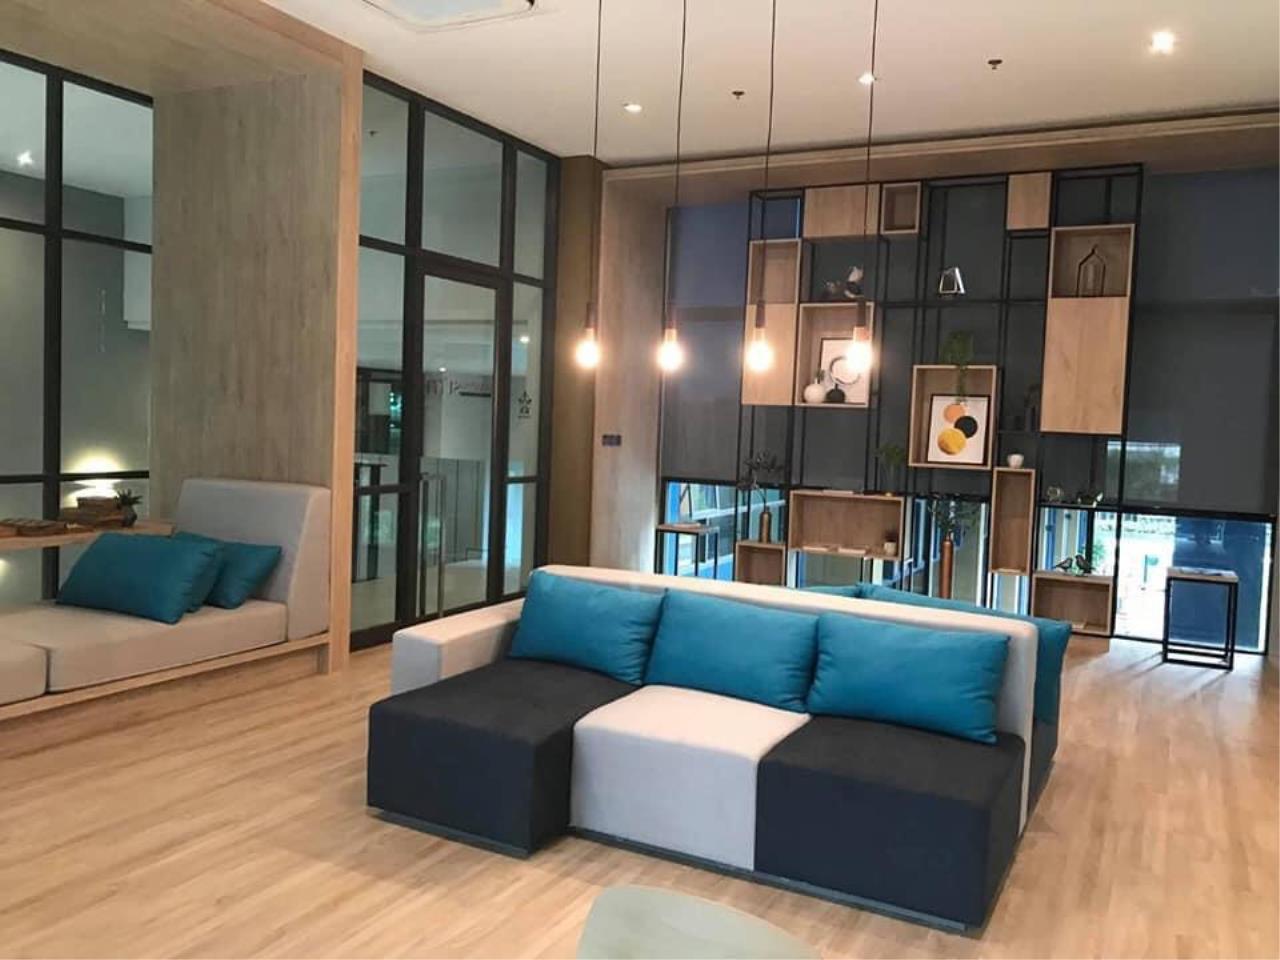 Agent - Phapayawarin Agency's Lumpini Suite Phetchaburi-Makkasan for Rent, Studio, 24 Sq.m., MRT Phetchaburi 9